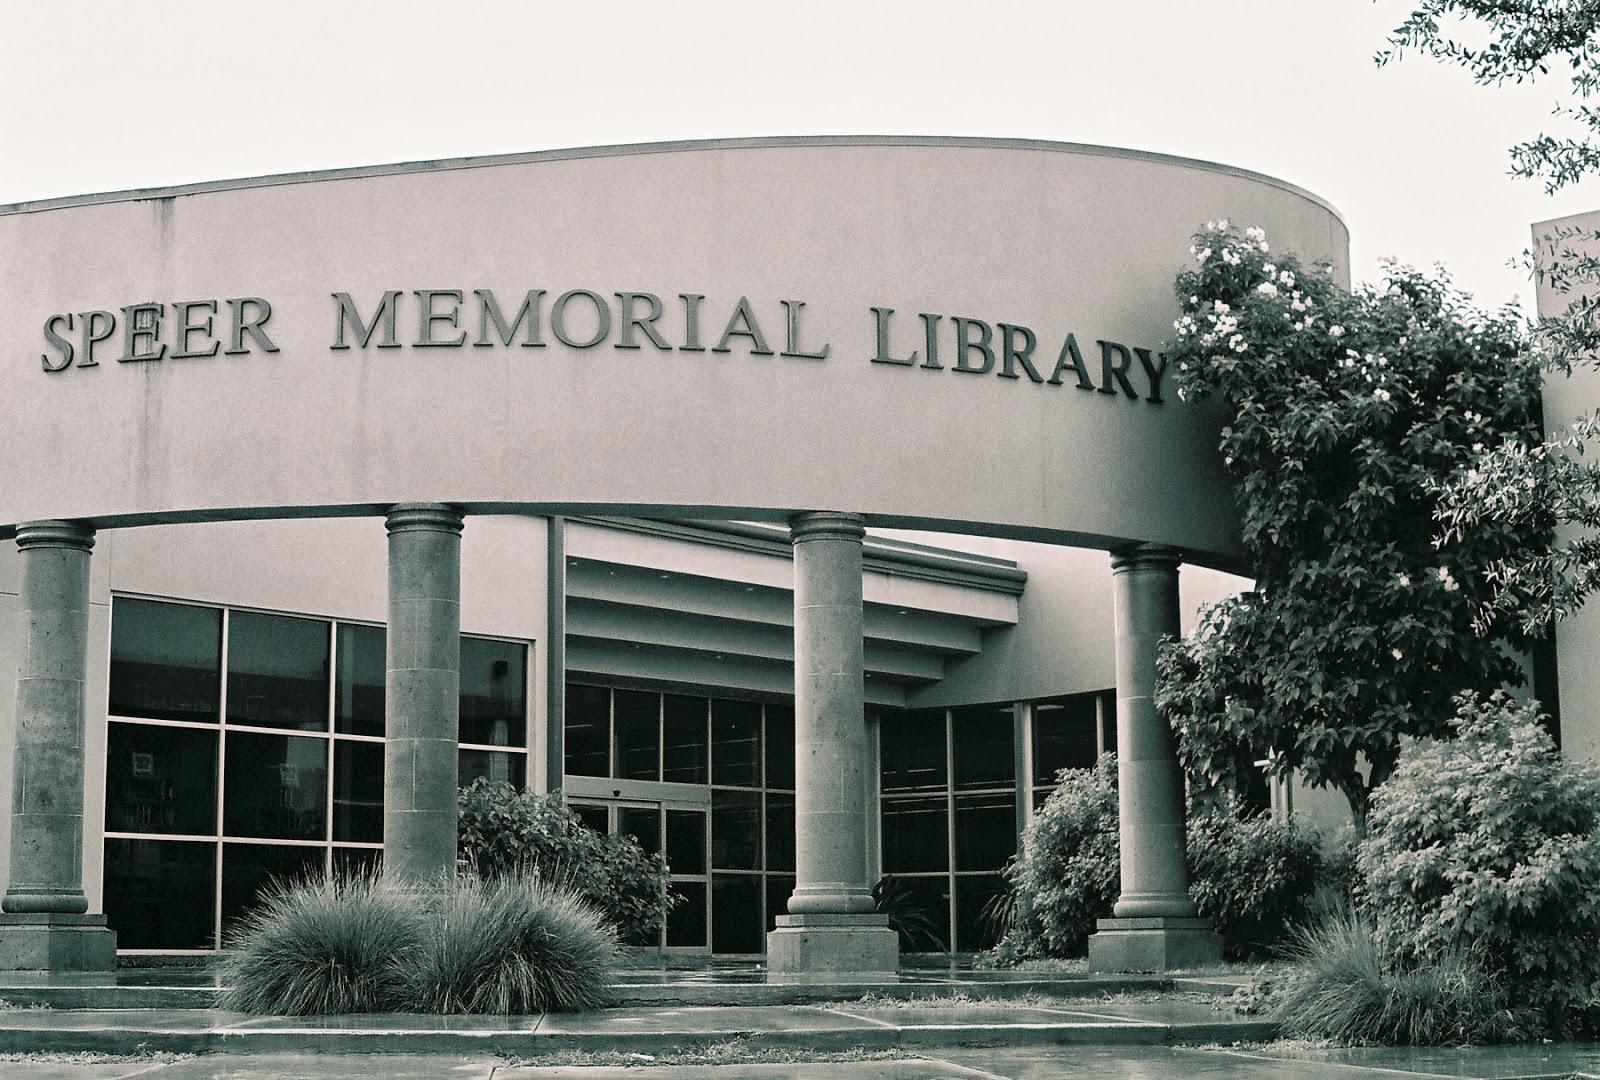 Mission Guide Blog Speer Memorial Library Board Meeting Apr 16